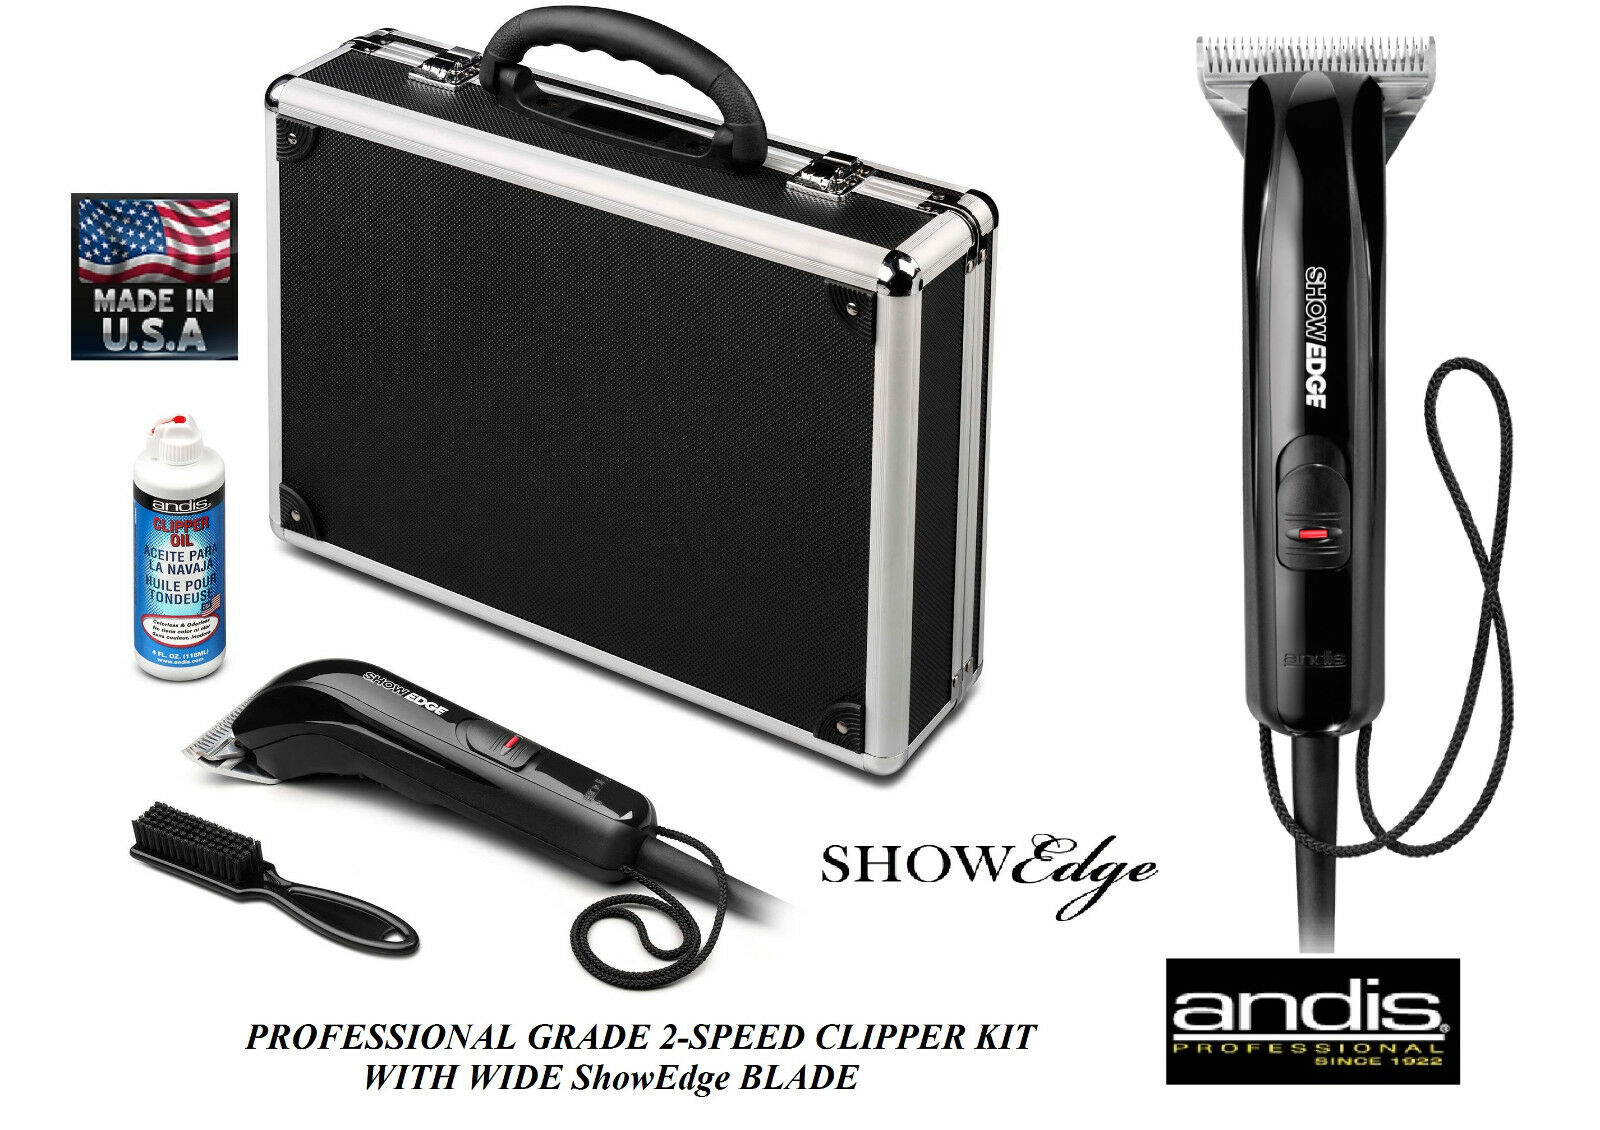 Andis Showedge Tosatrice Kit&ultraedge Lama Set, Custodia Cane Cavallo, Bestiame